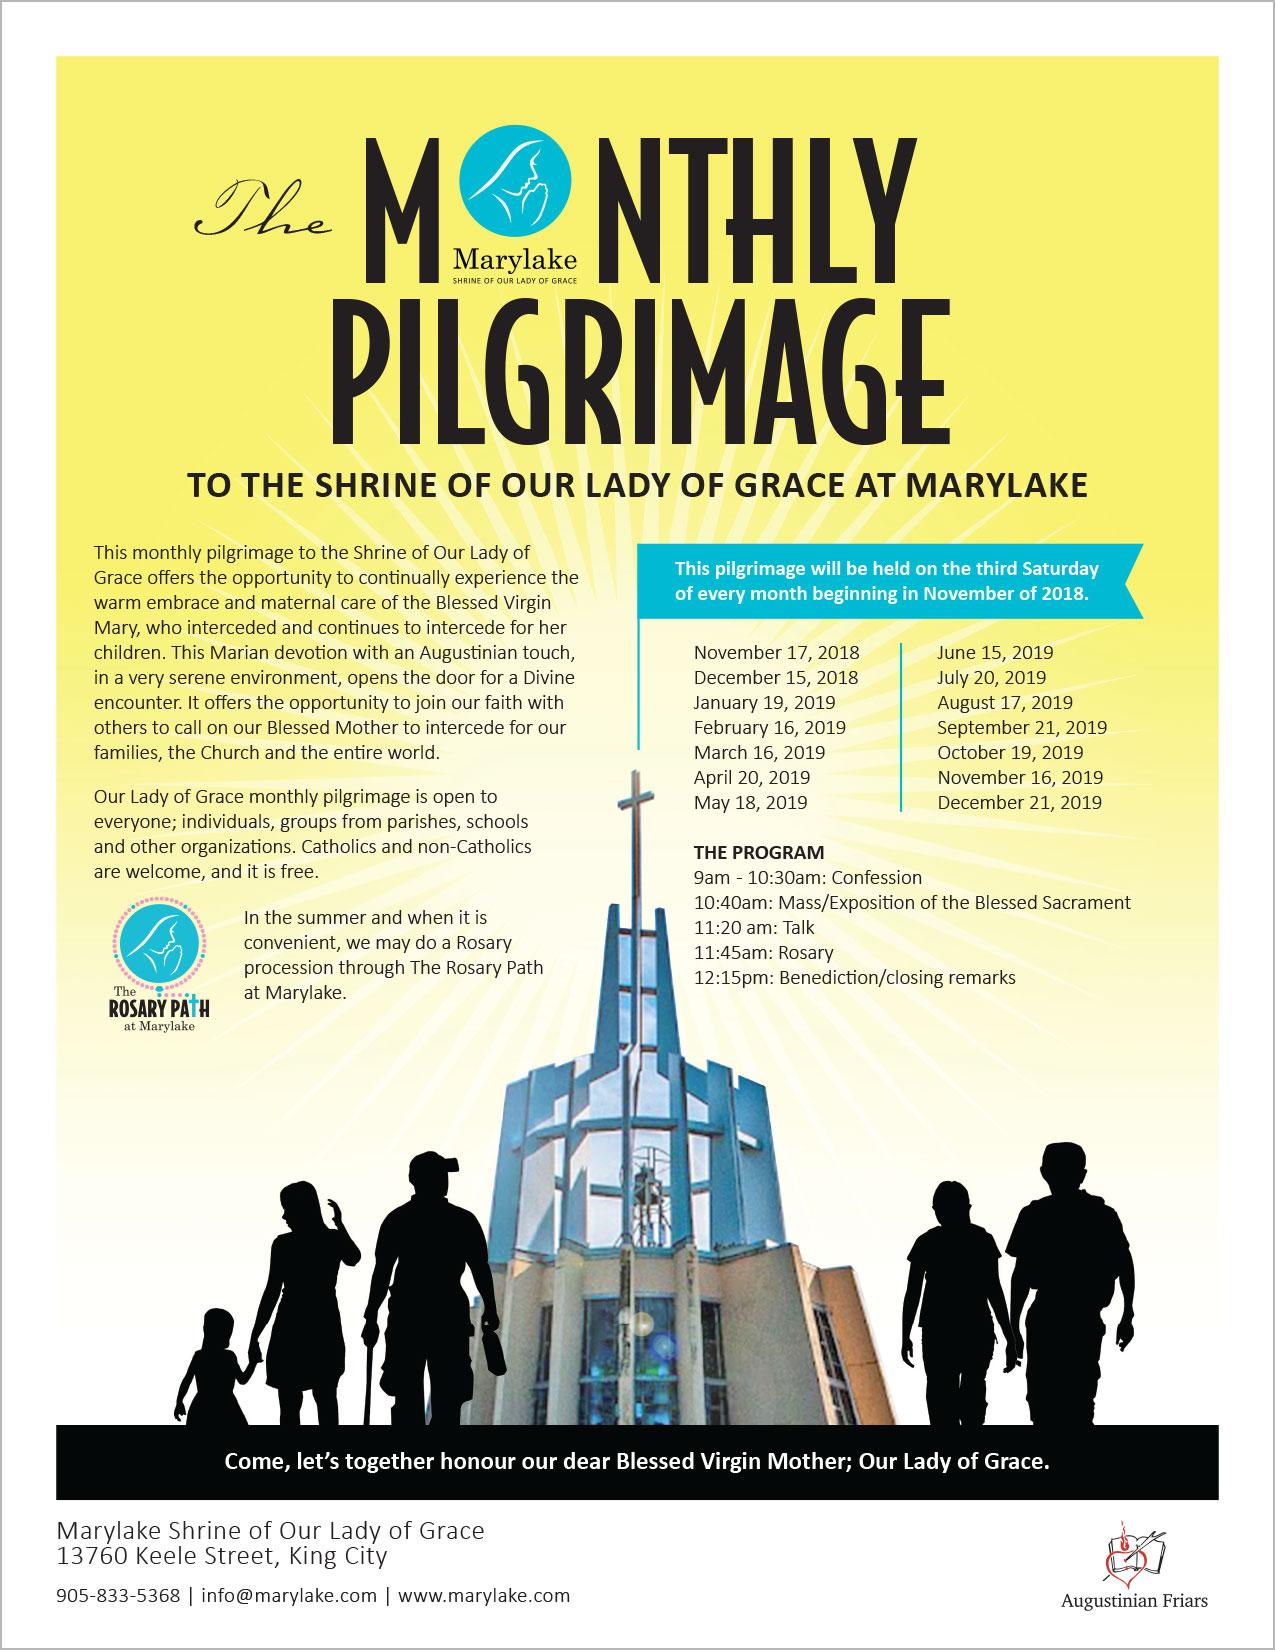 marylake_monthly_pilgrimage_8.5x11.jpg